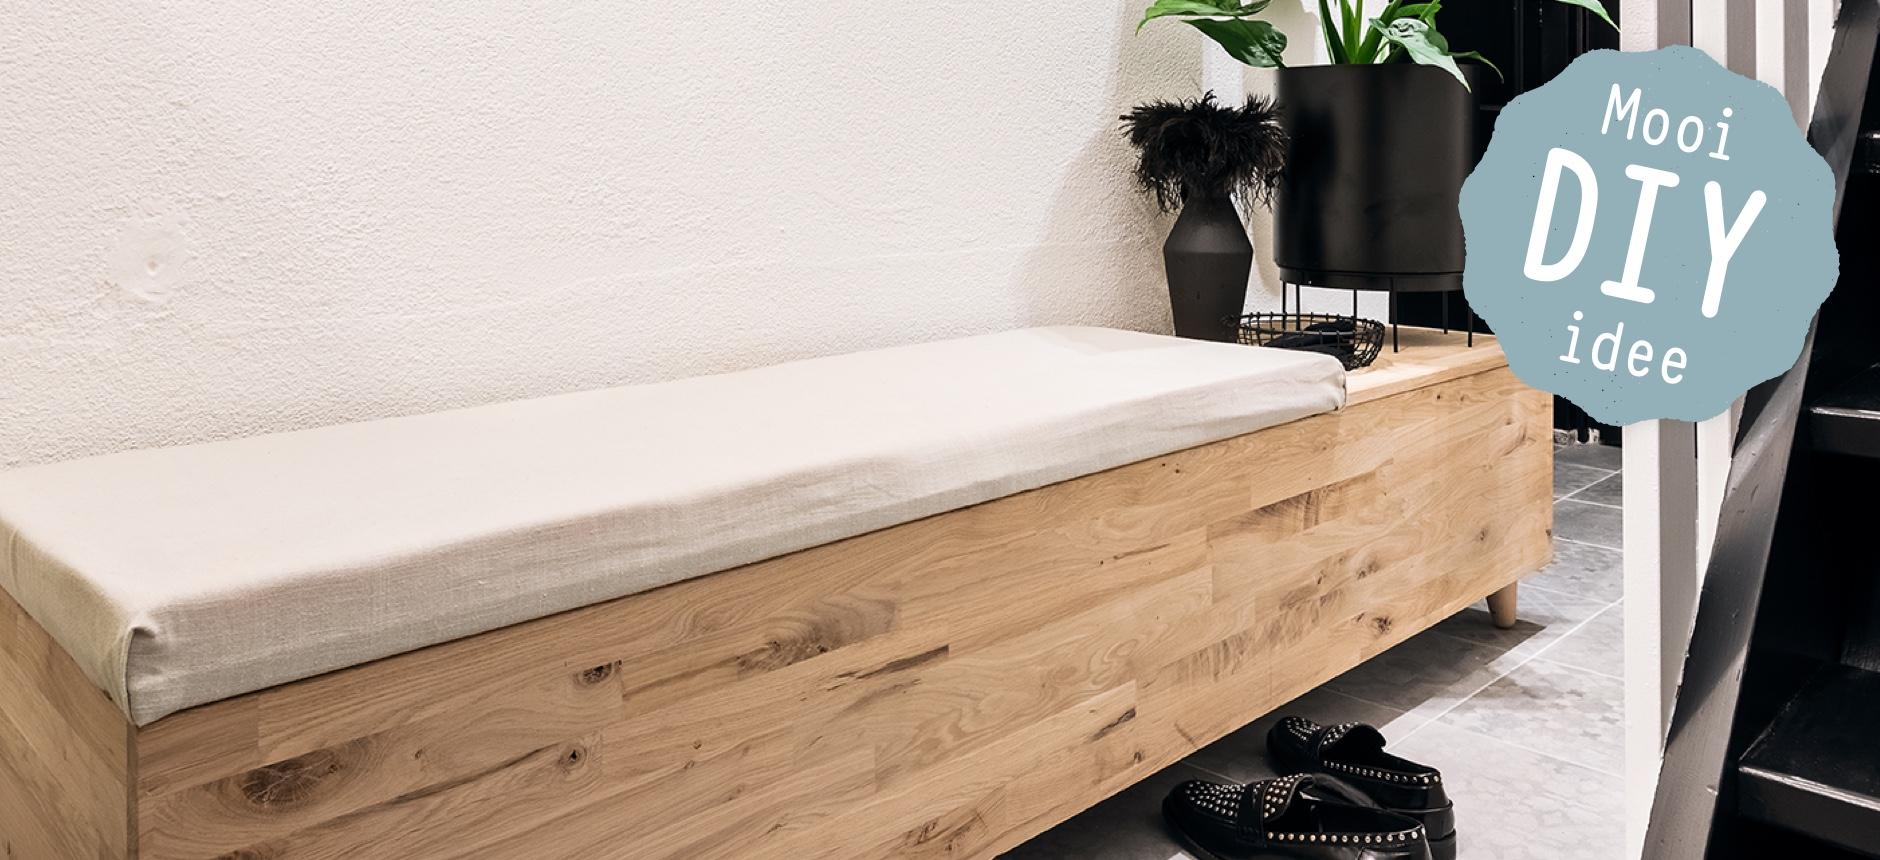 Plank Blind Ophangen Karwei.Karwei Zagen Bij Suuz Styling En Interieur Mijn Unieke Diy Voor Karwei